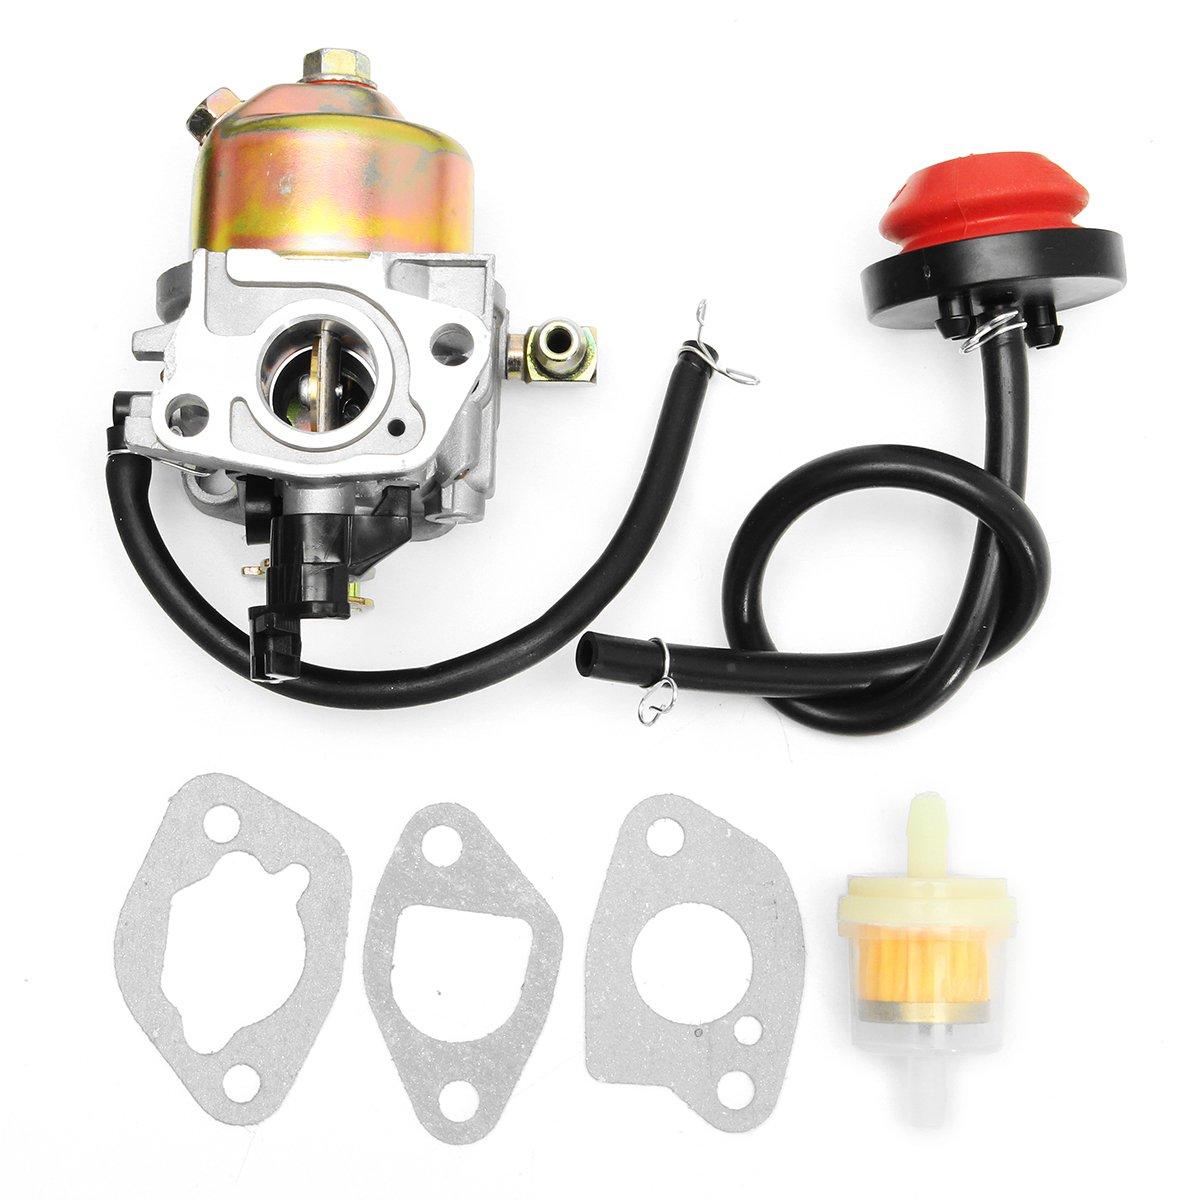 ILS - Snowblower Carburetor W/ Gasket Pirmer For HUAYI 170S 170SA 165S 165SA Carb I LOVE SHOPPING